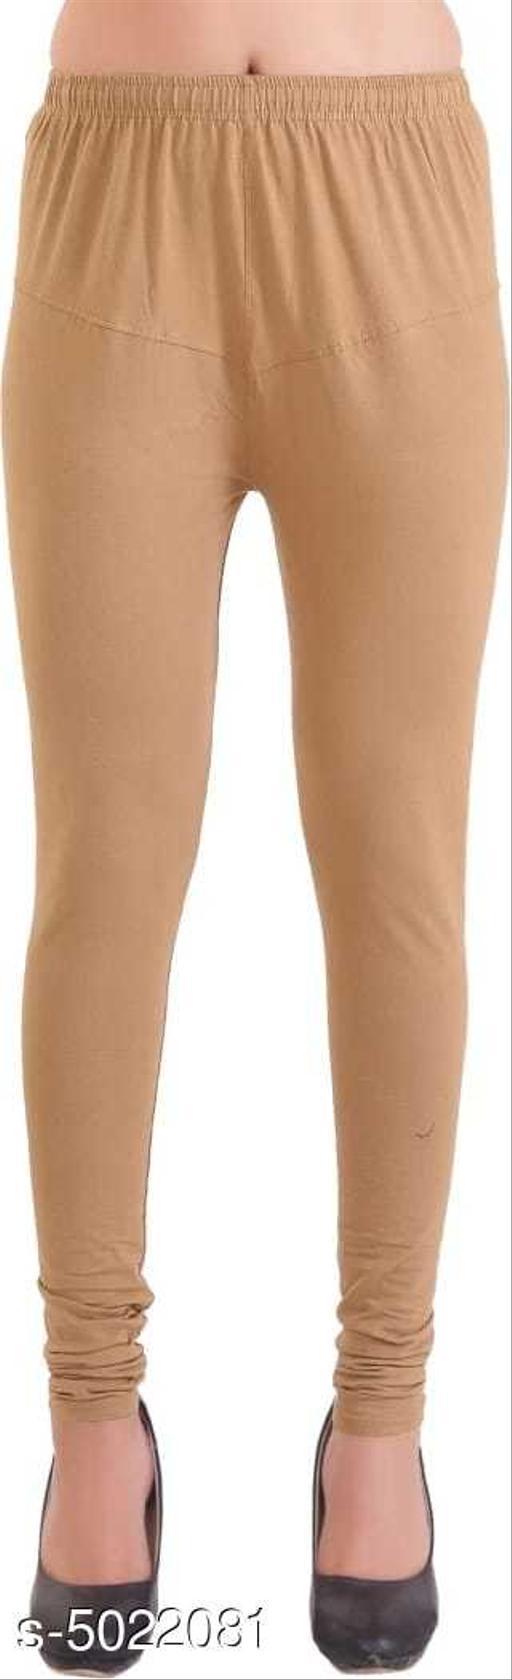 Classy Women's  Leggings